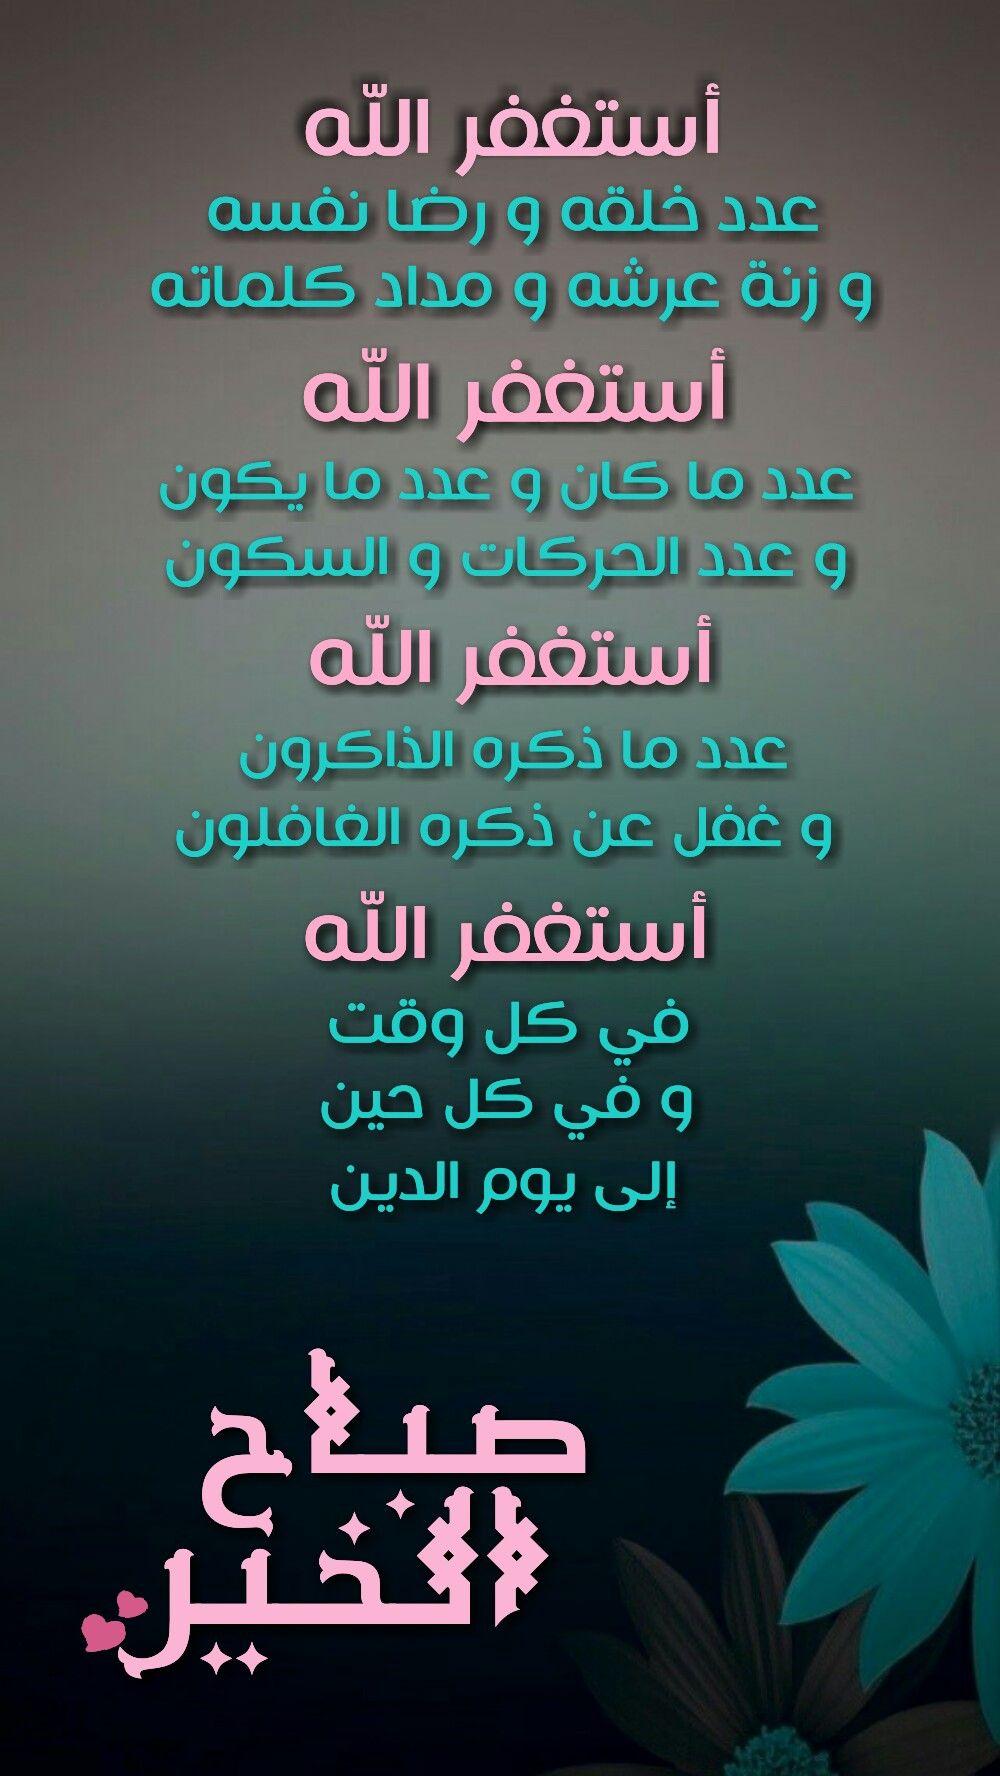 Pin By Ranya Anis On صباحيات و مسائيات Morning Quotes Images Good Morning Greetings Good Morning Good Night